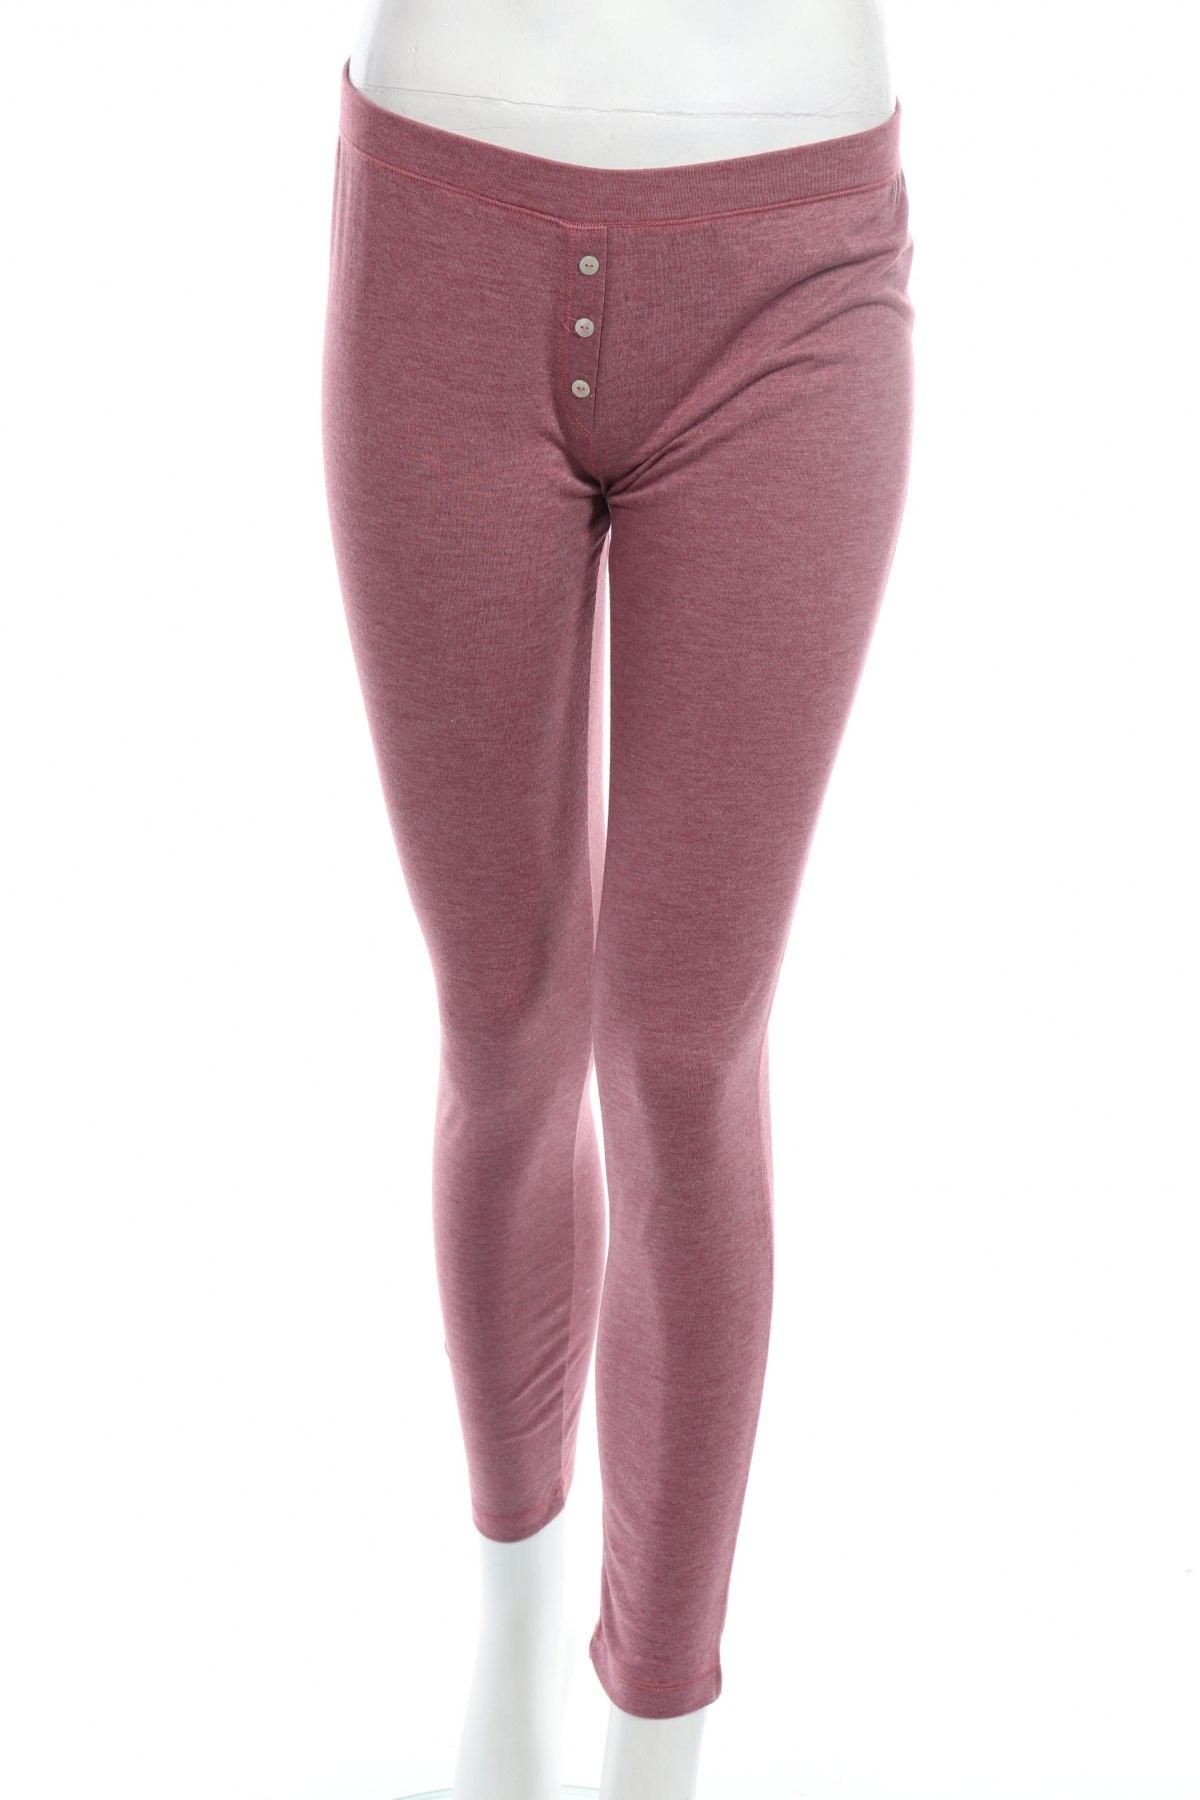 Пижама Louis & Louisa, Размер S, Цвят Розов, 70% вискоза, 25% полиестер, 5% еластан, Цена 33,00лв.